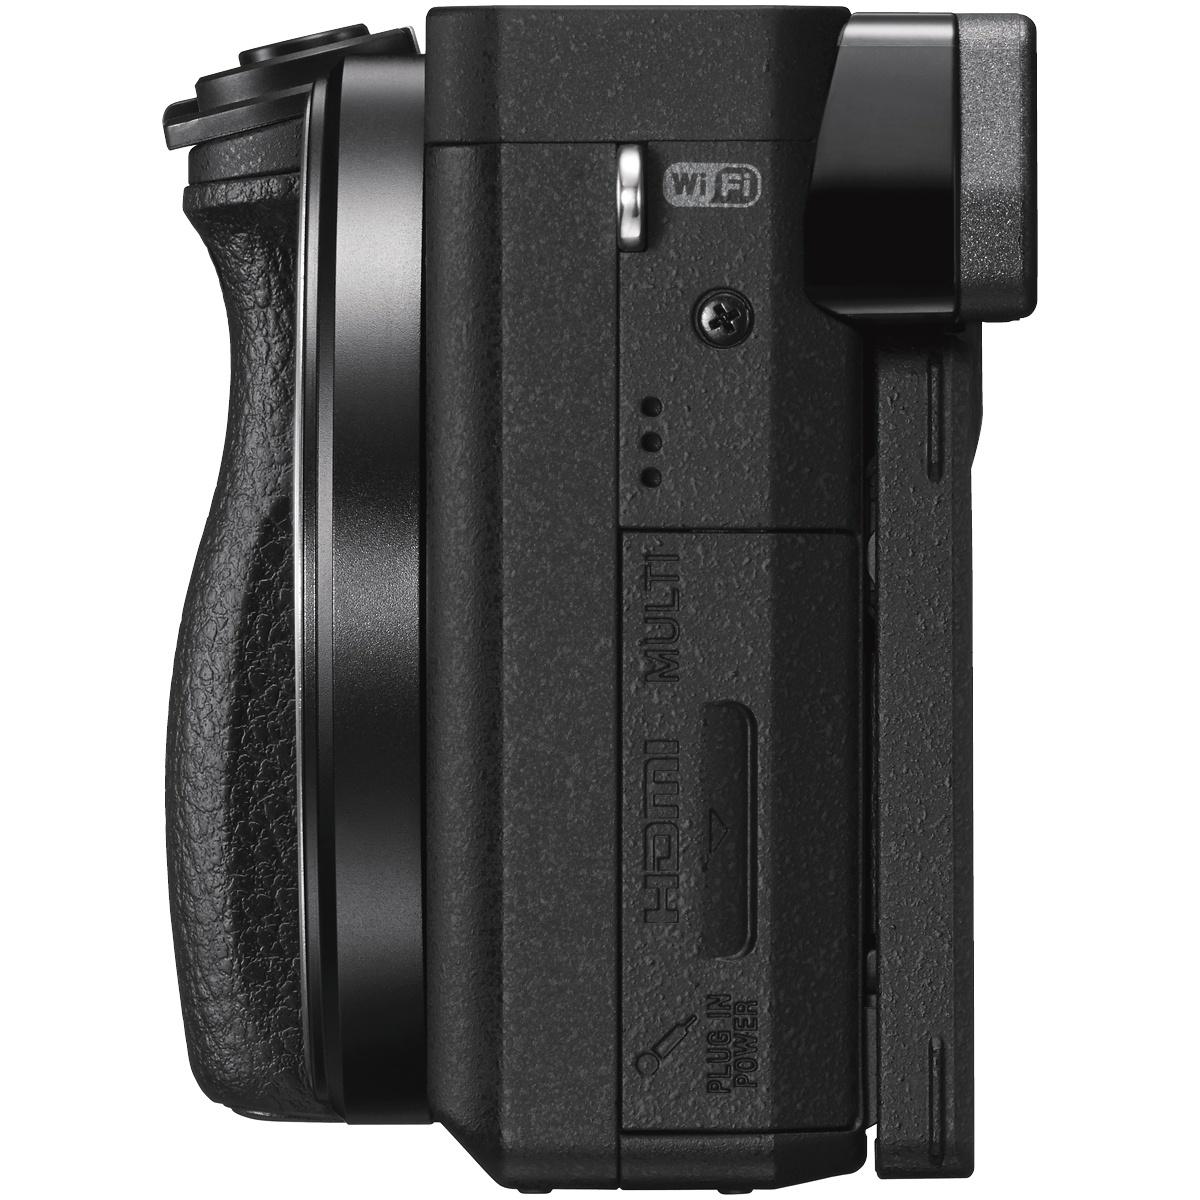 Sony Alpha 6300 Kit mit 18-135 mm 1:3,5-5,6